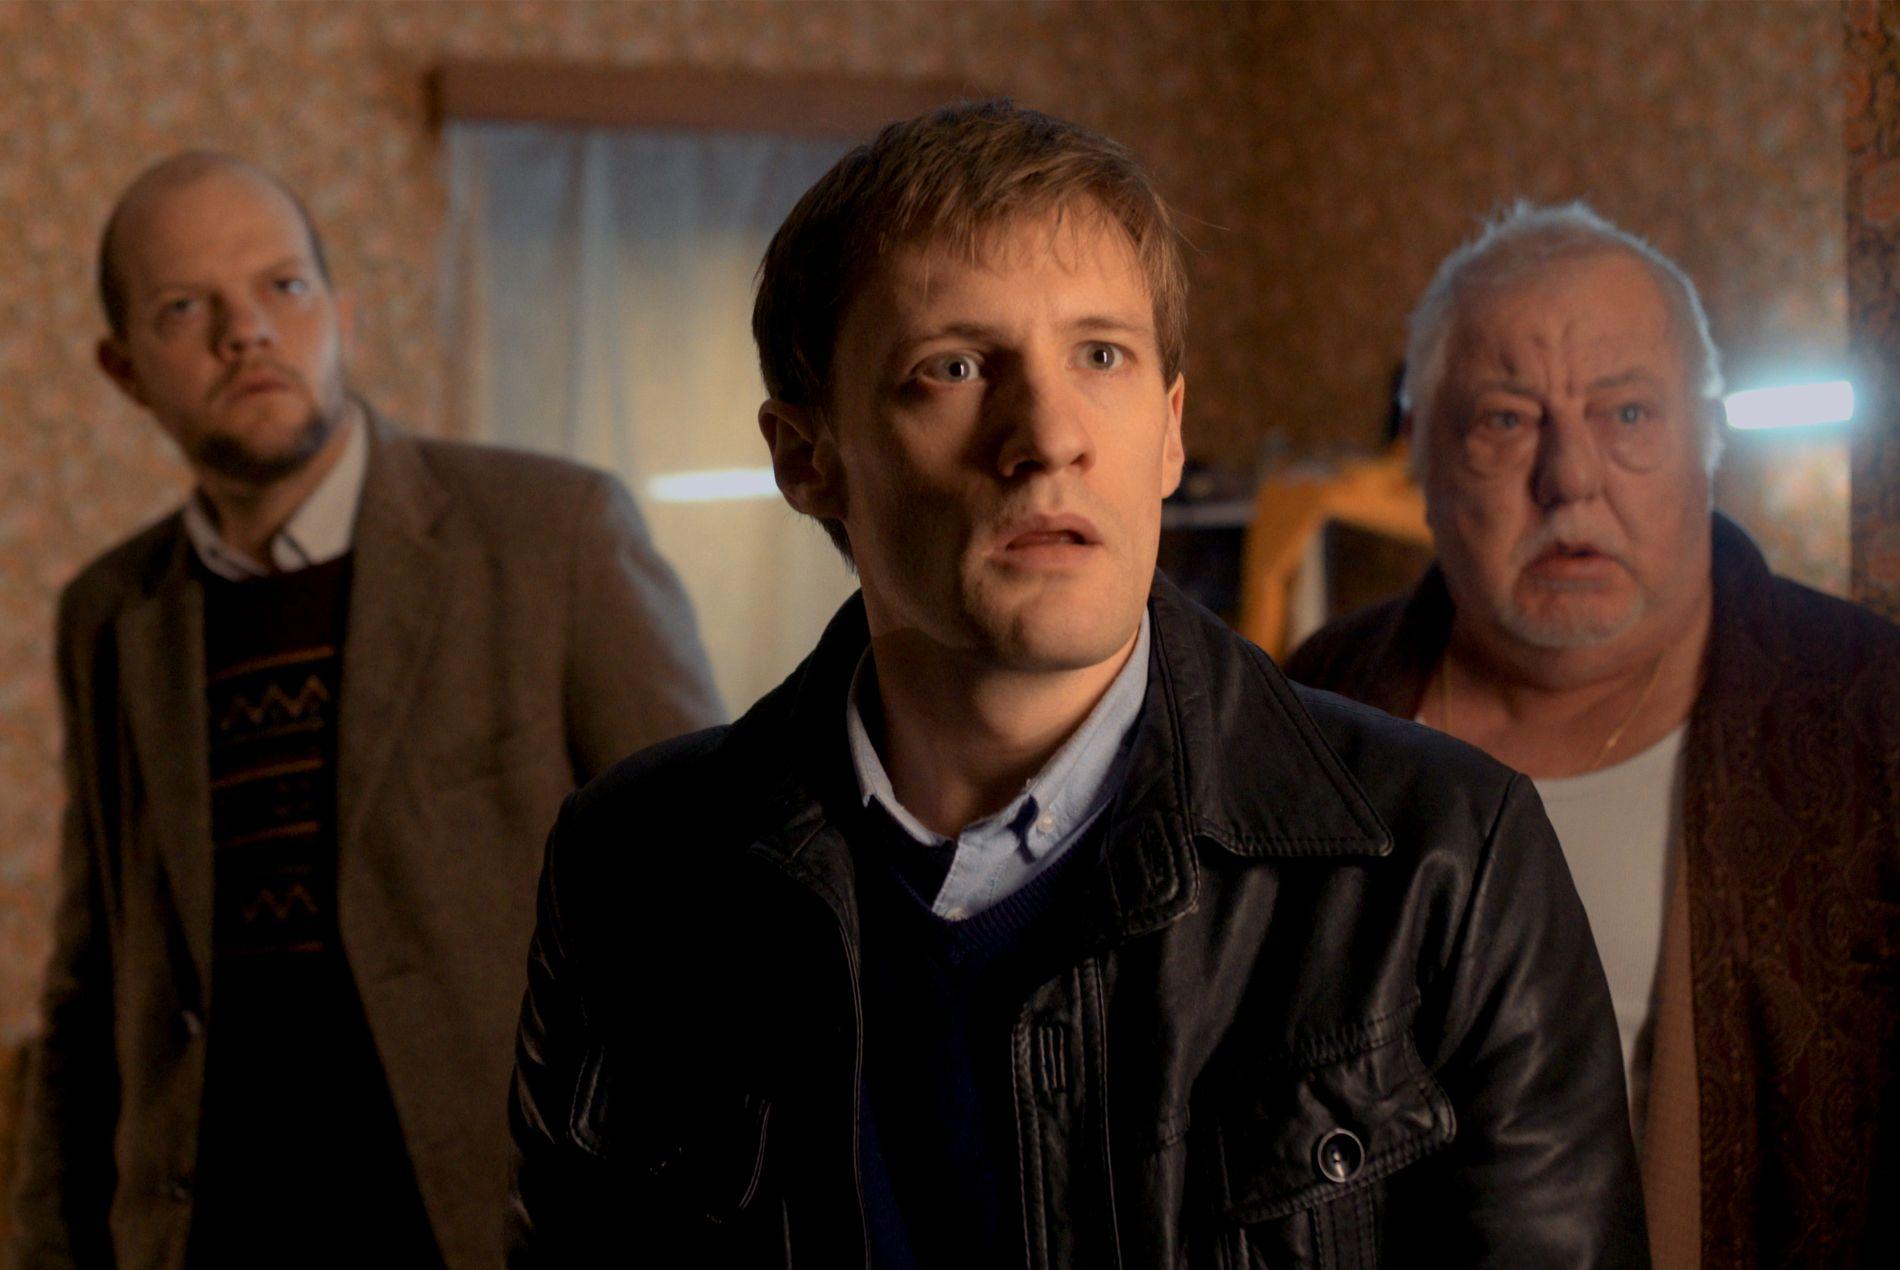 KRIMGÅTE: Yoann Blanc (t.v.) som Yoann Peeters i sesong 1 av «La trêve/The Break».